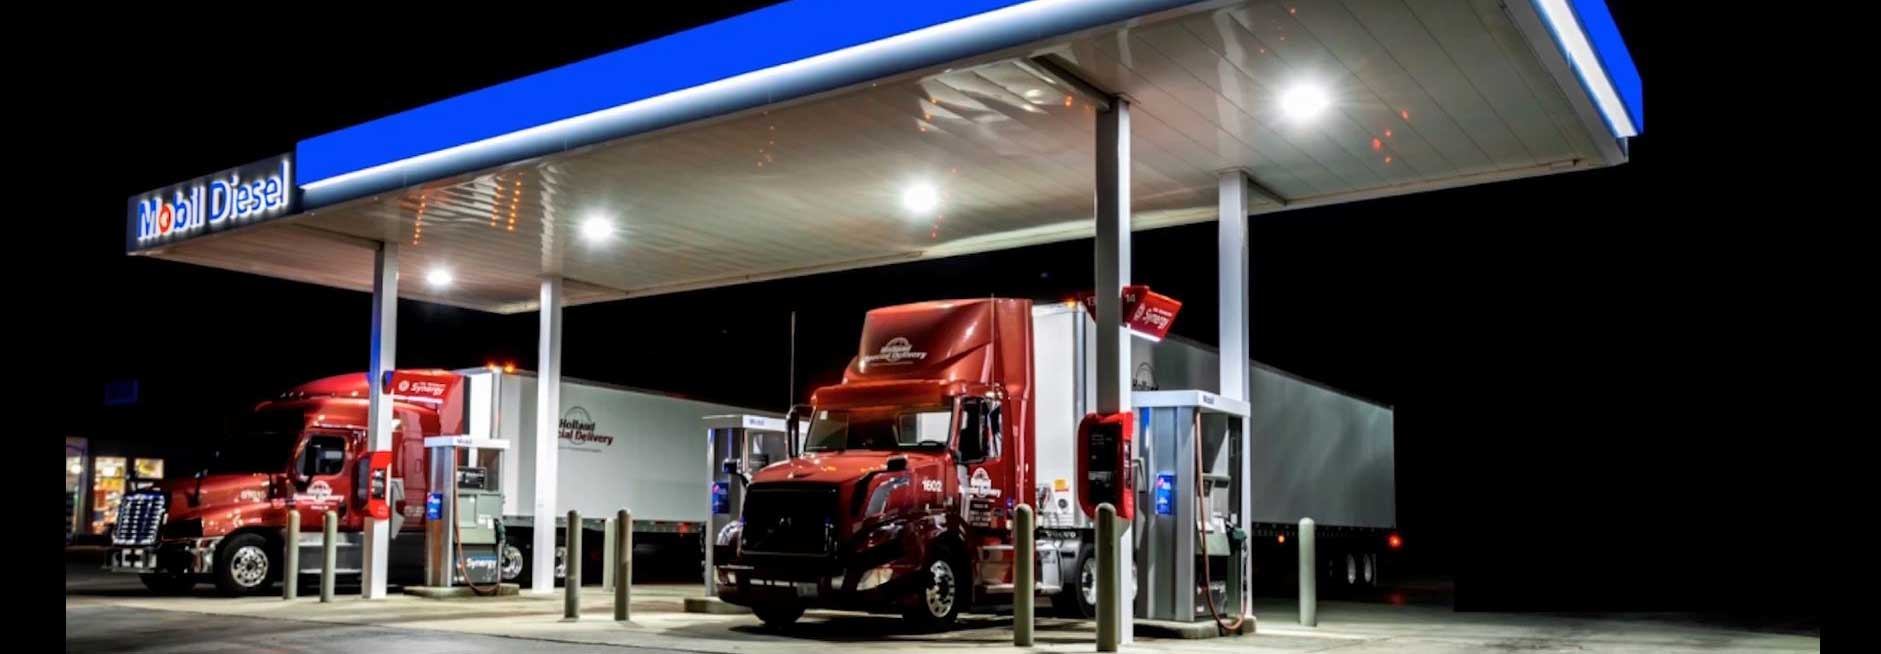 ExxonMobil Debuting New Diesel and Branding Program